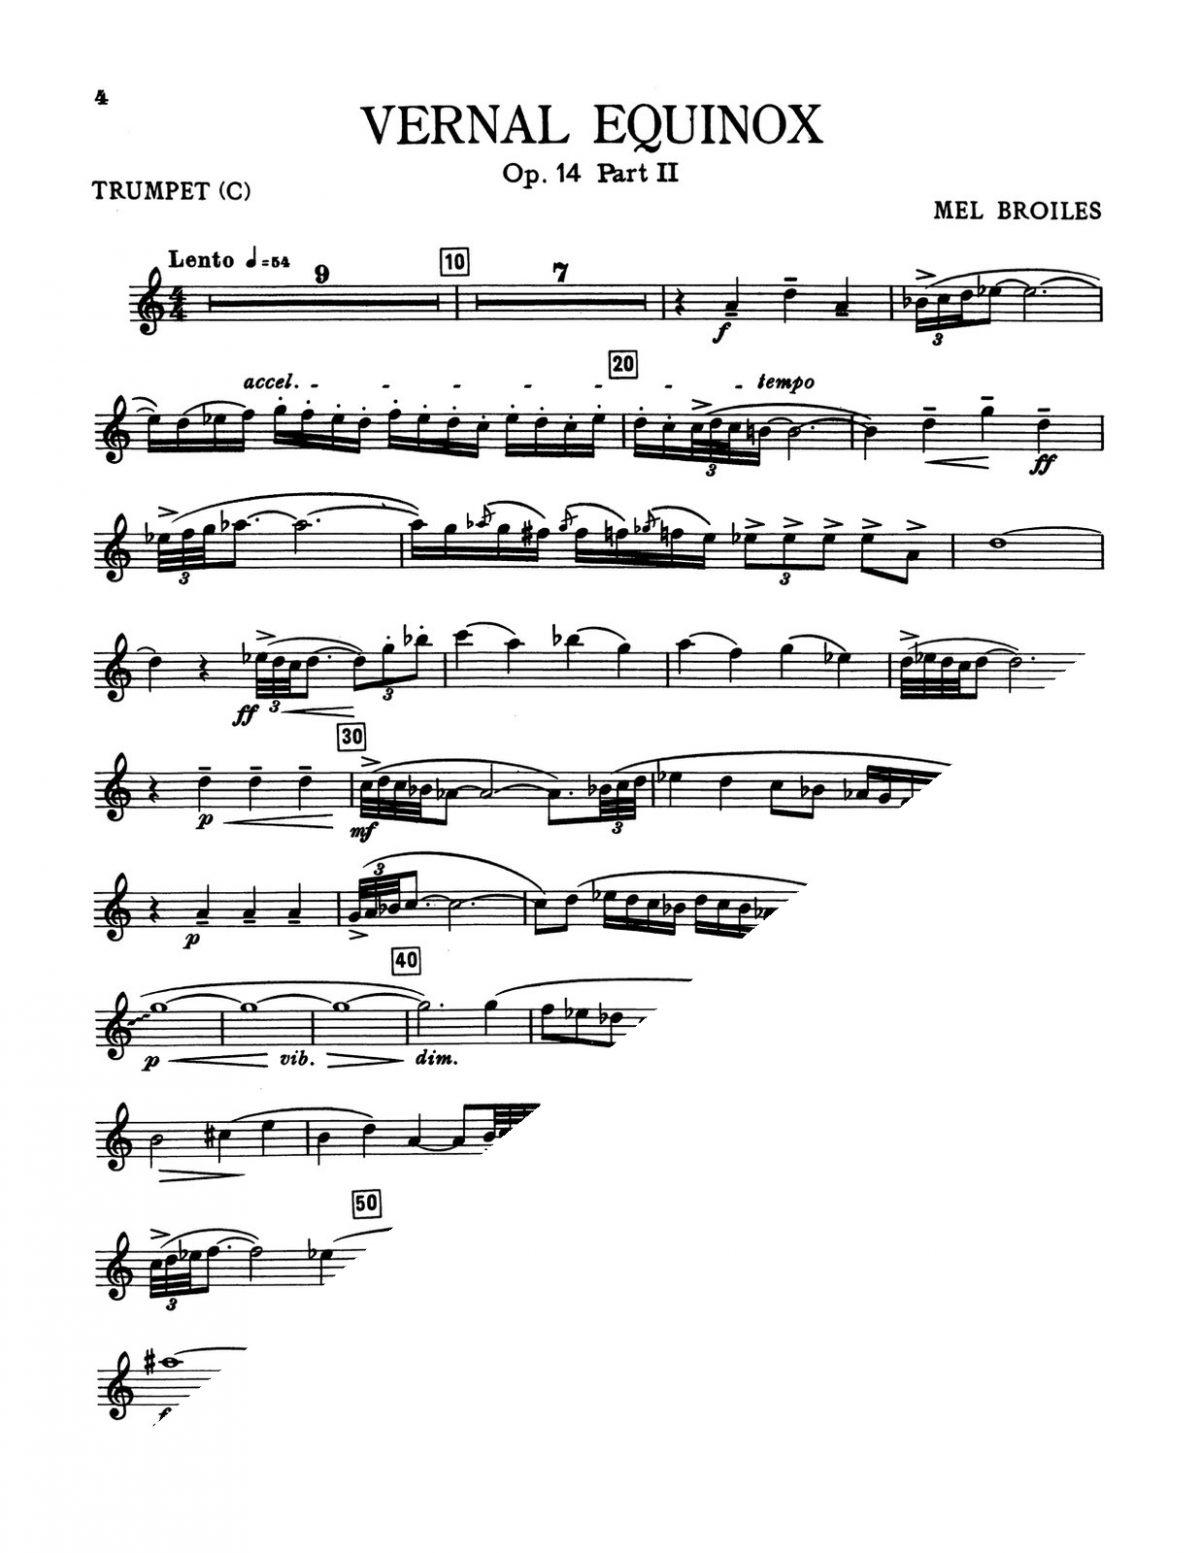 Broiles, Vernal Equinox (Trumpet & Piano)-p06